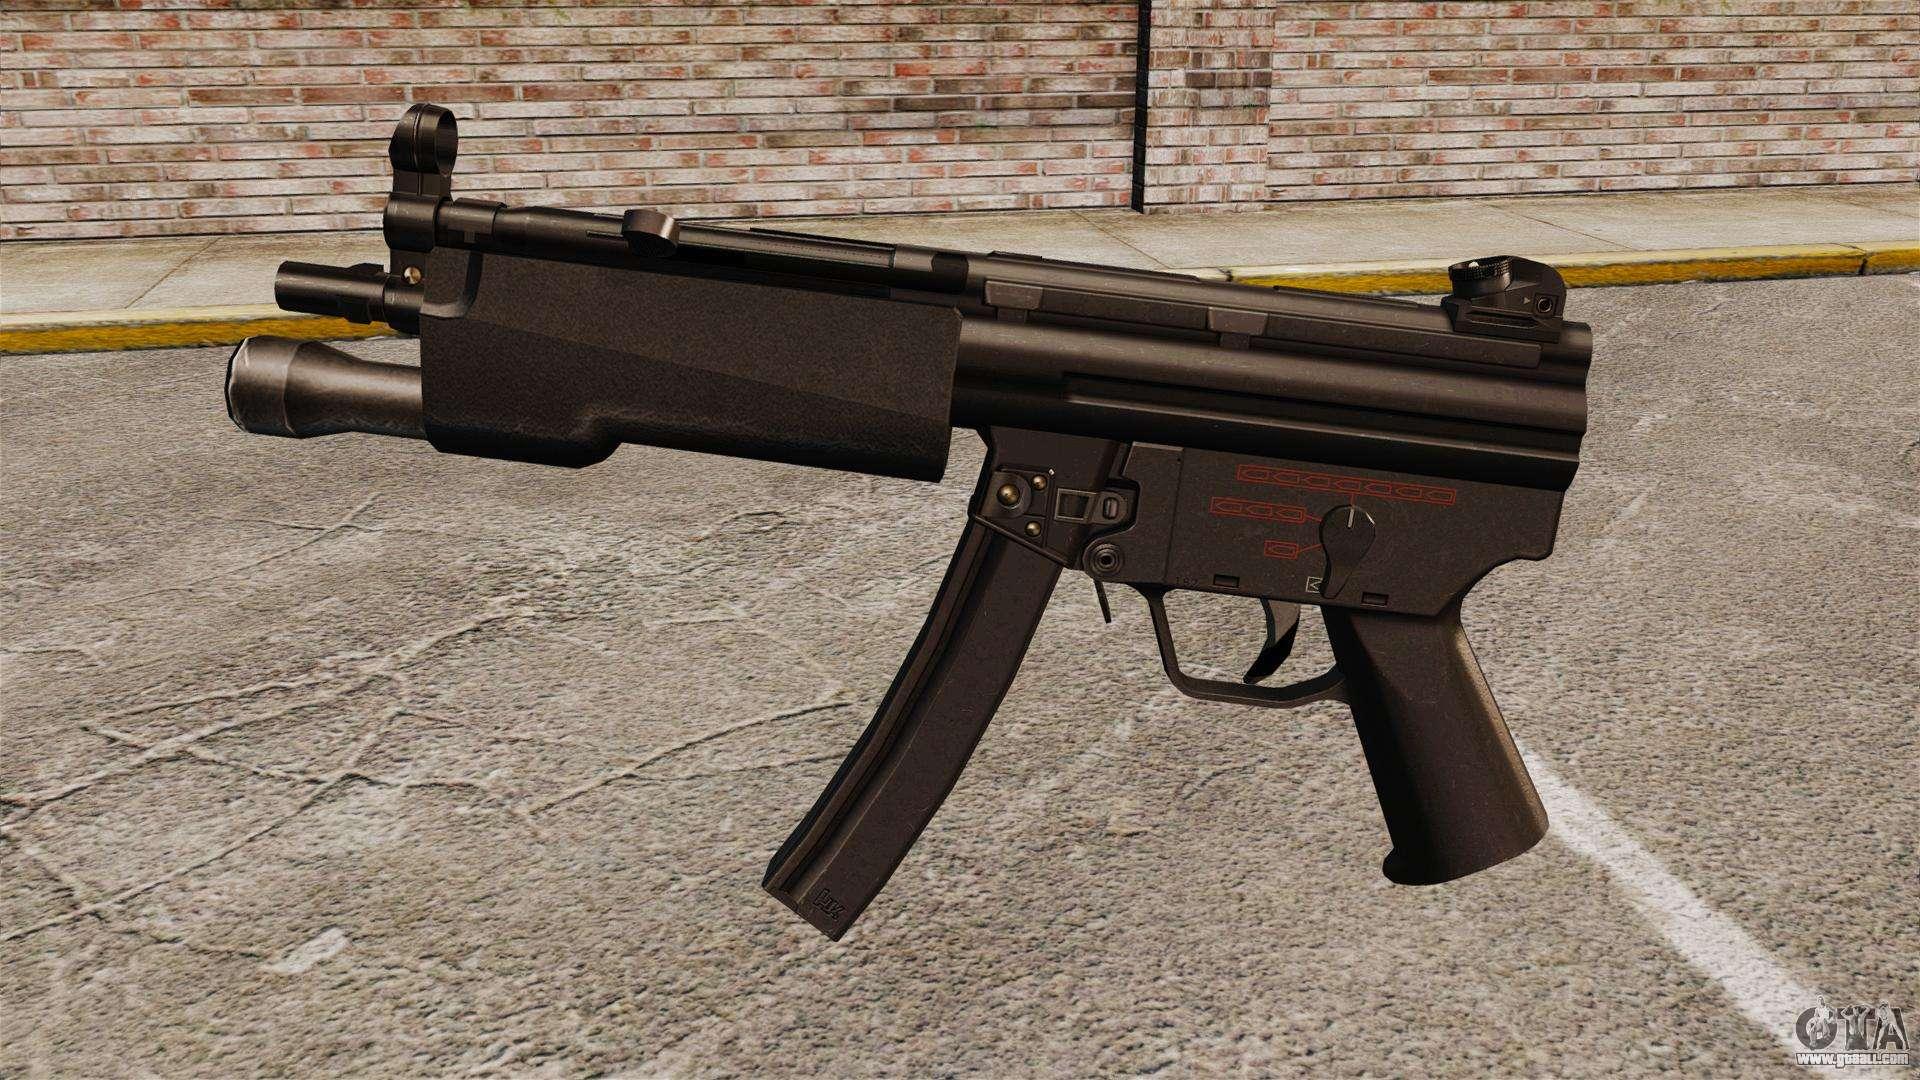 Hk mp5 submachine gun for gta 4 for Portent g3 sw 12